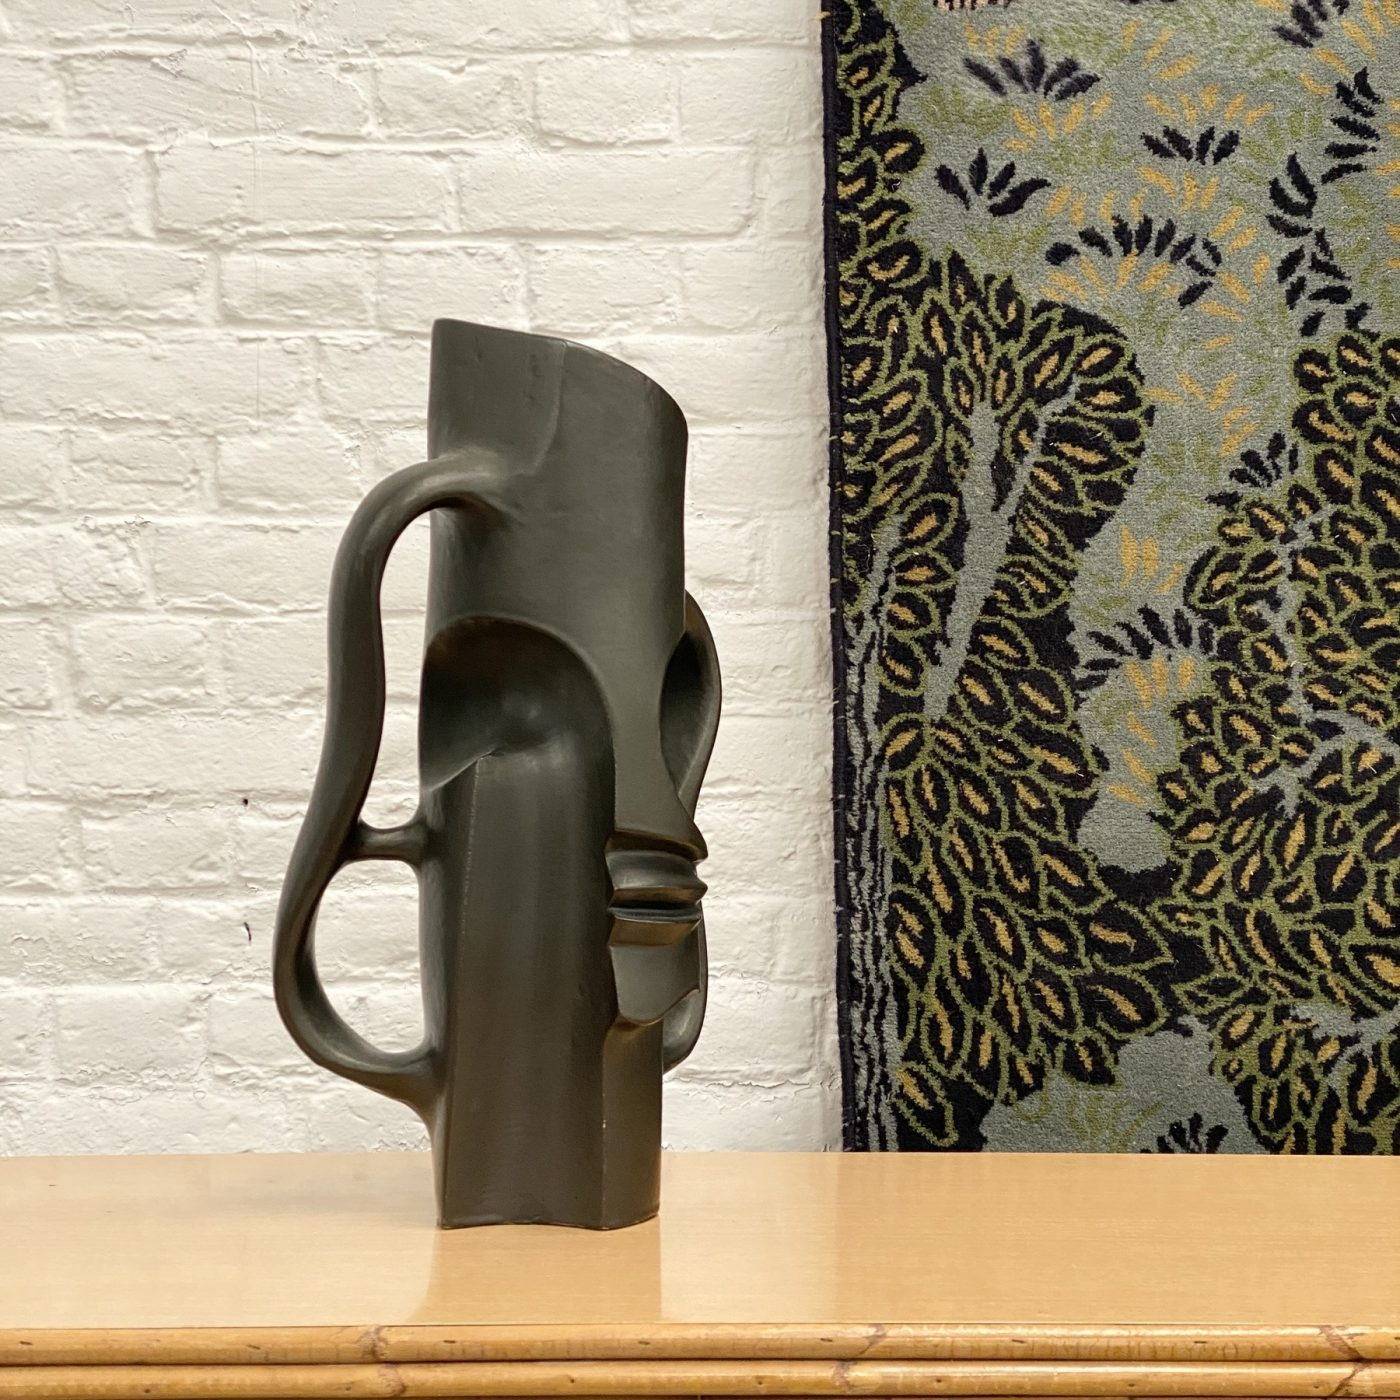 objet-vagabond-ceramic-sculpture0005